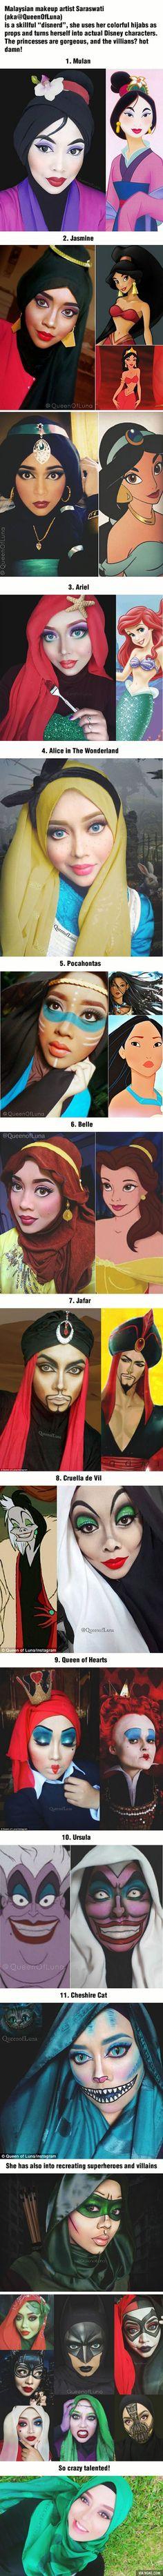 Malaysian Makeup Artist Transforms Into Stunning Disney Characters Using Her Hijab